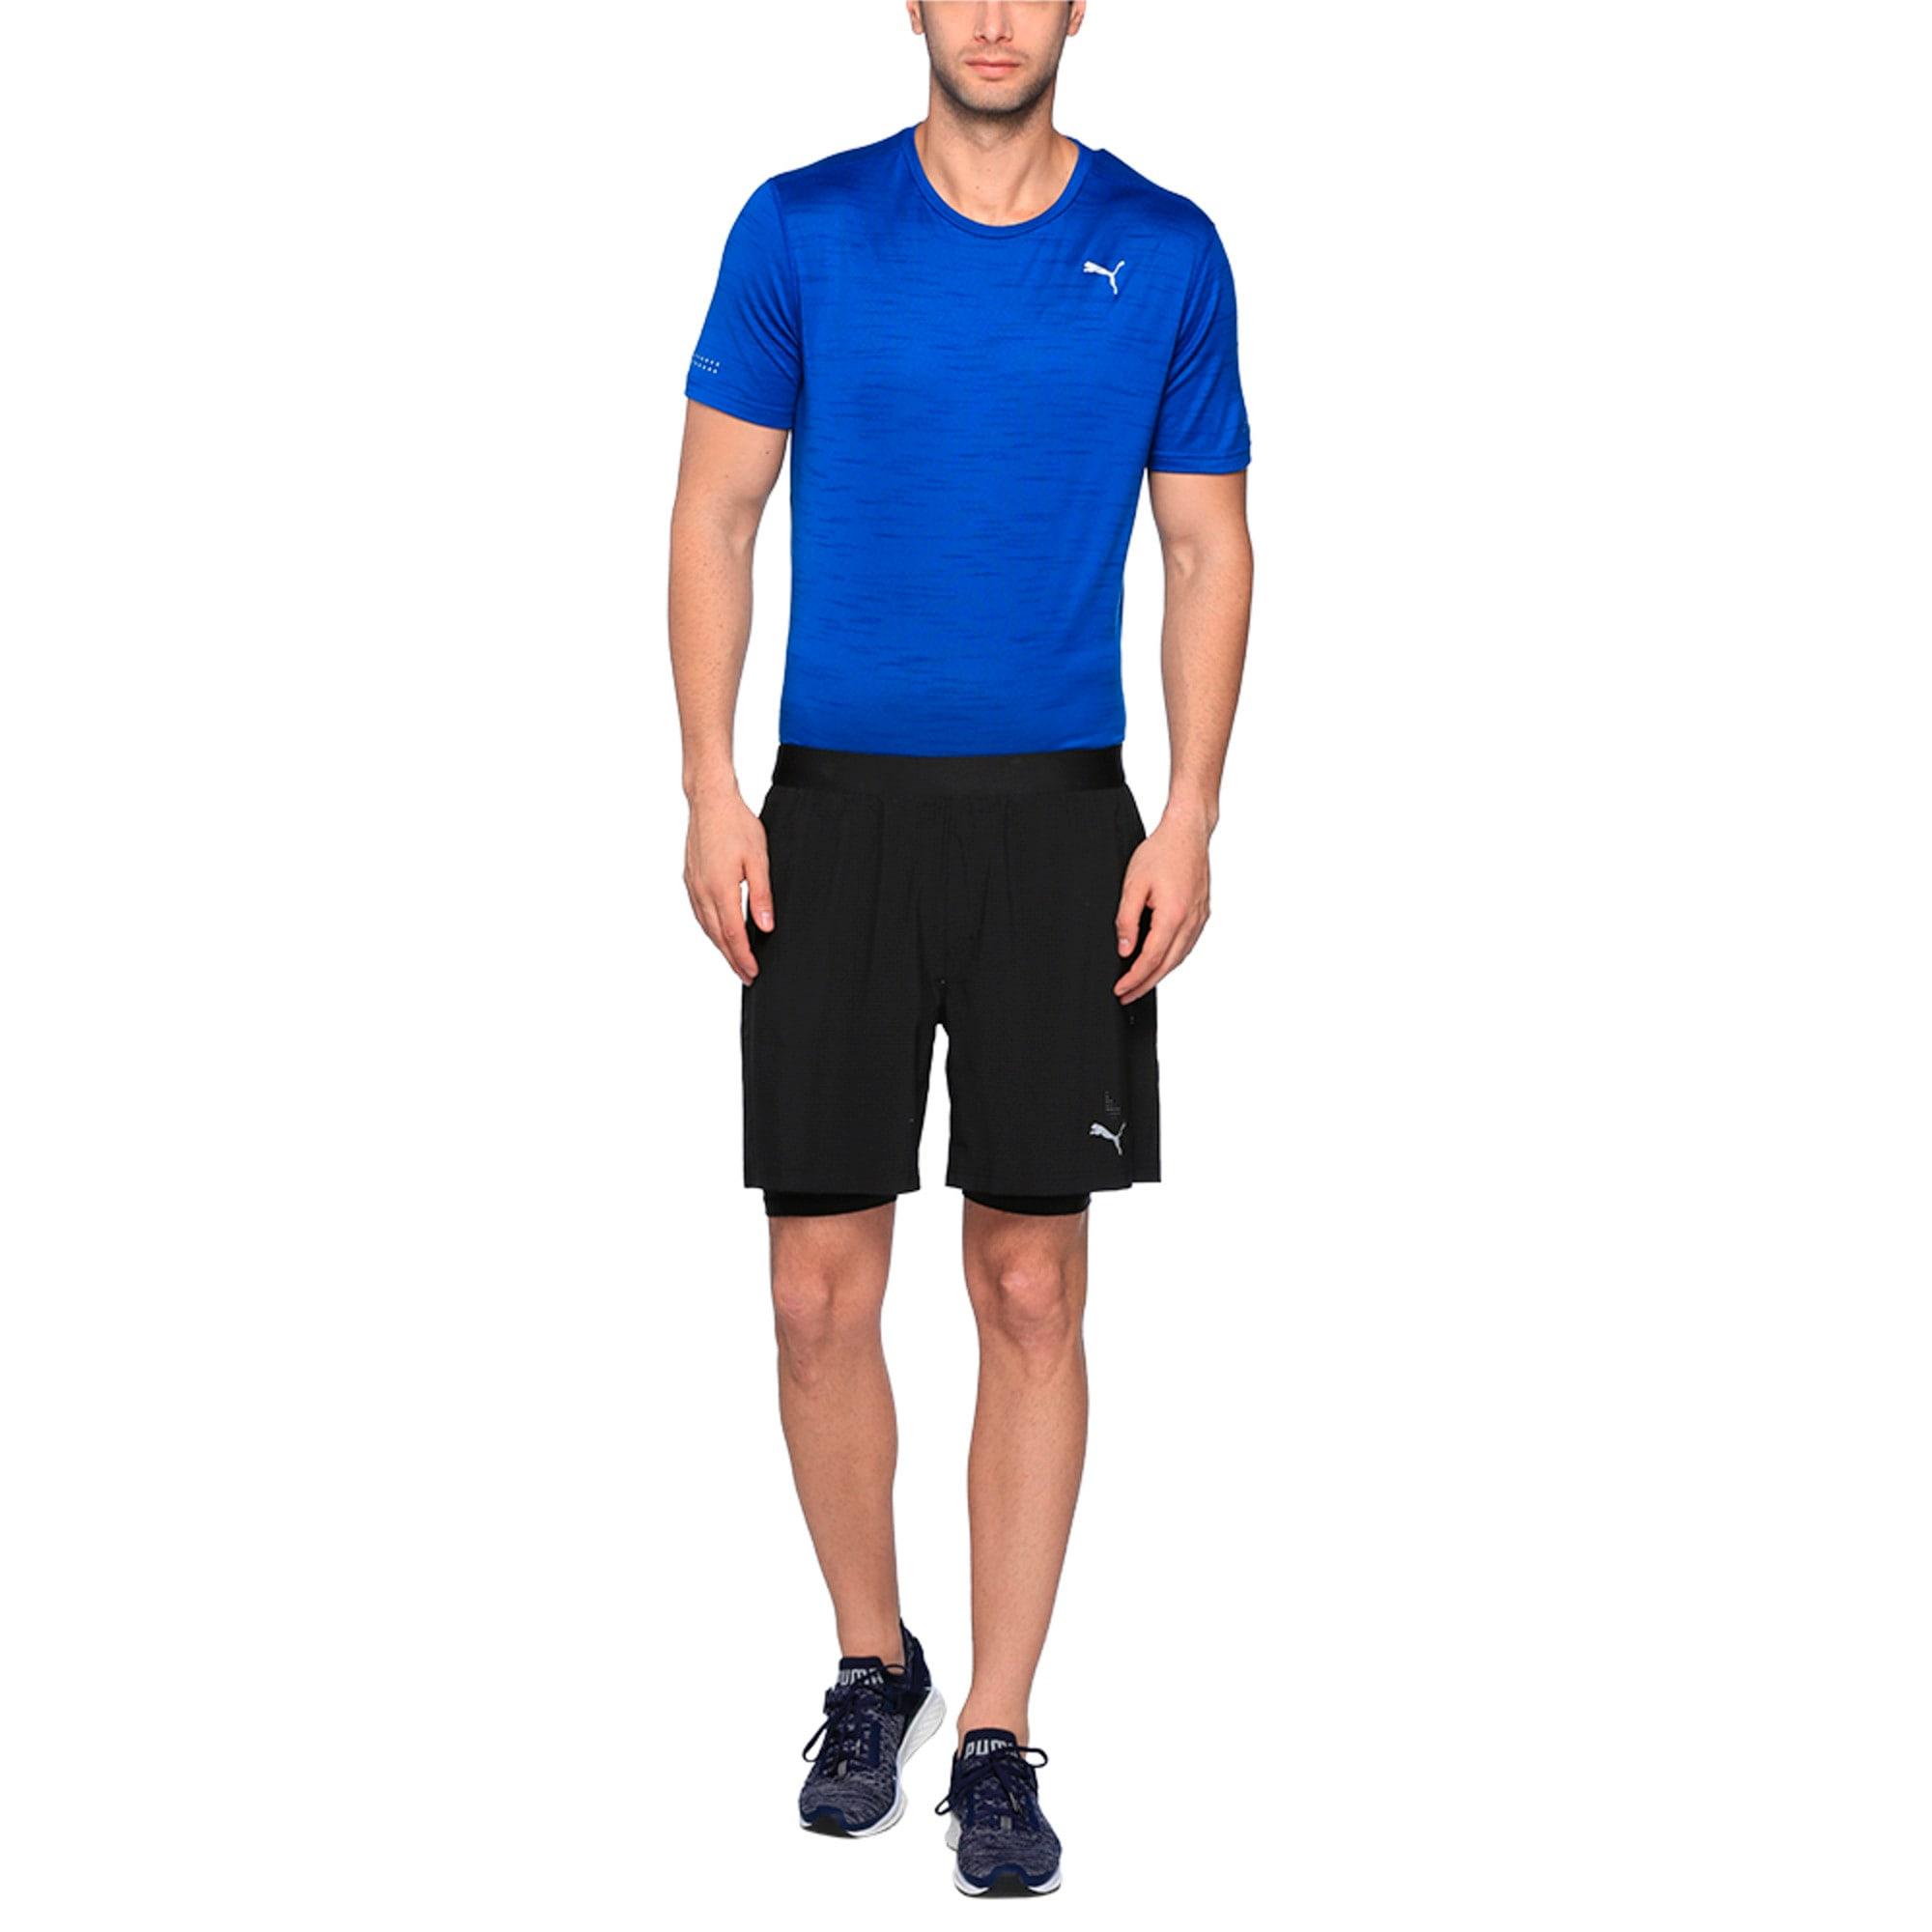 Thumbnail 2 of Running Men's Pace 2 in 1 Shorts, Puma Black, medium-IND